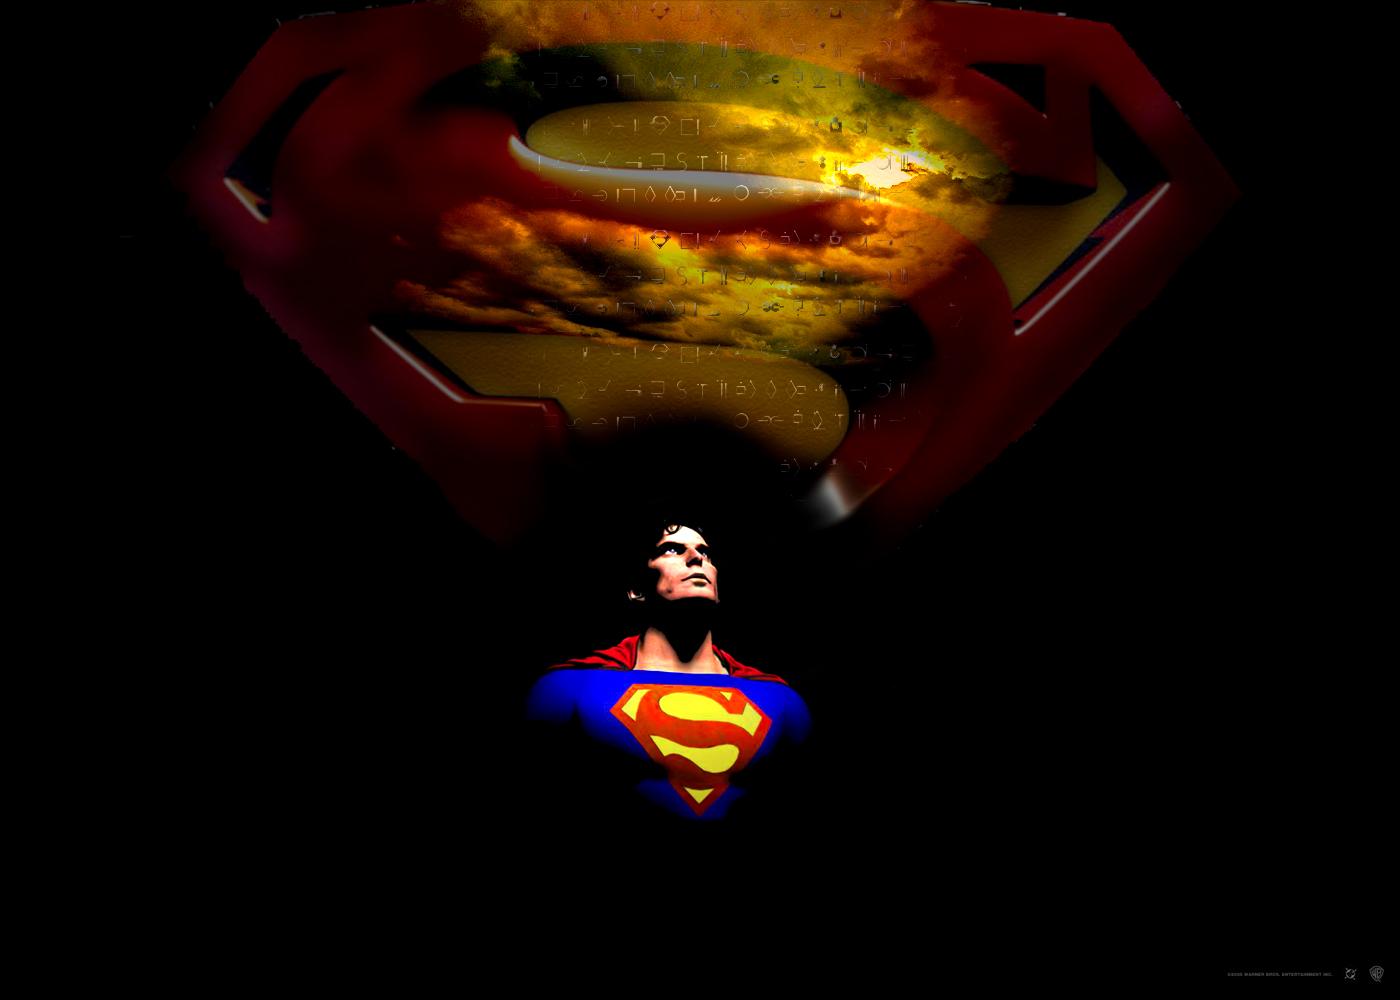 nerdy awesome superman wallpaper - photo #15